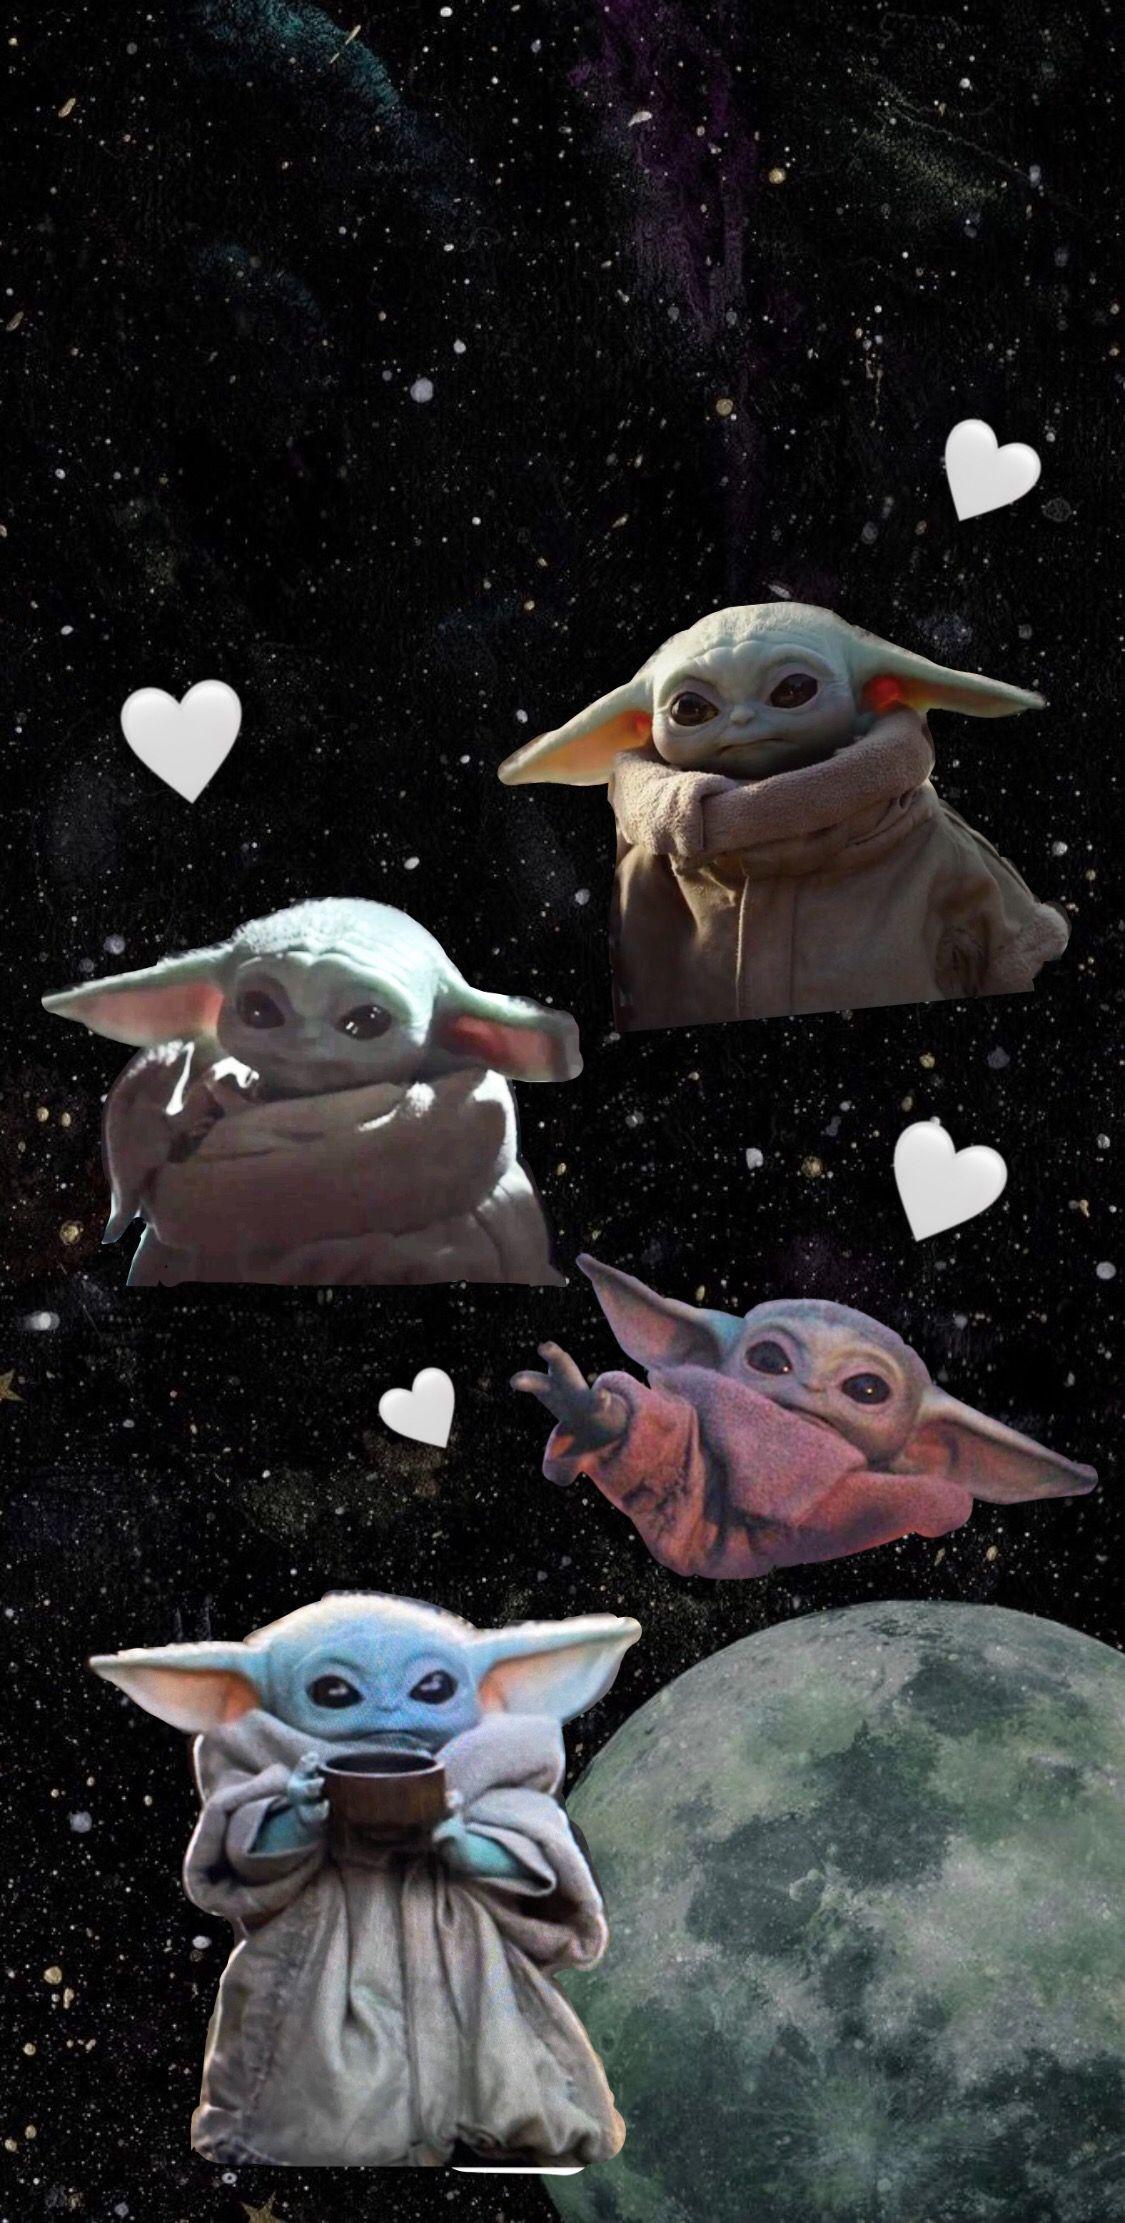 Baby Yoda Yoda Wallpaper Star Wars Wallpaper Yoda Images